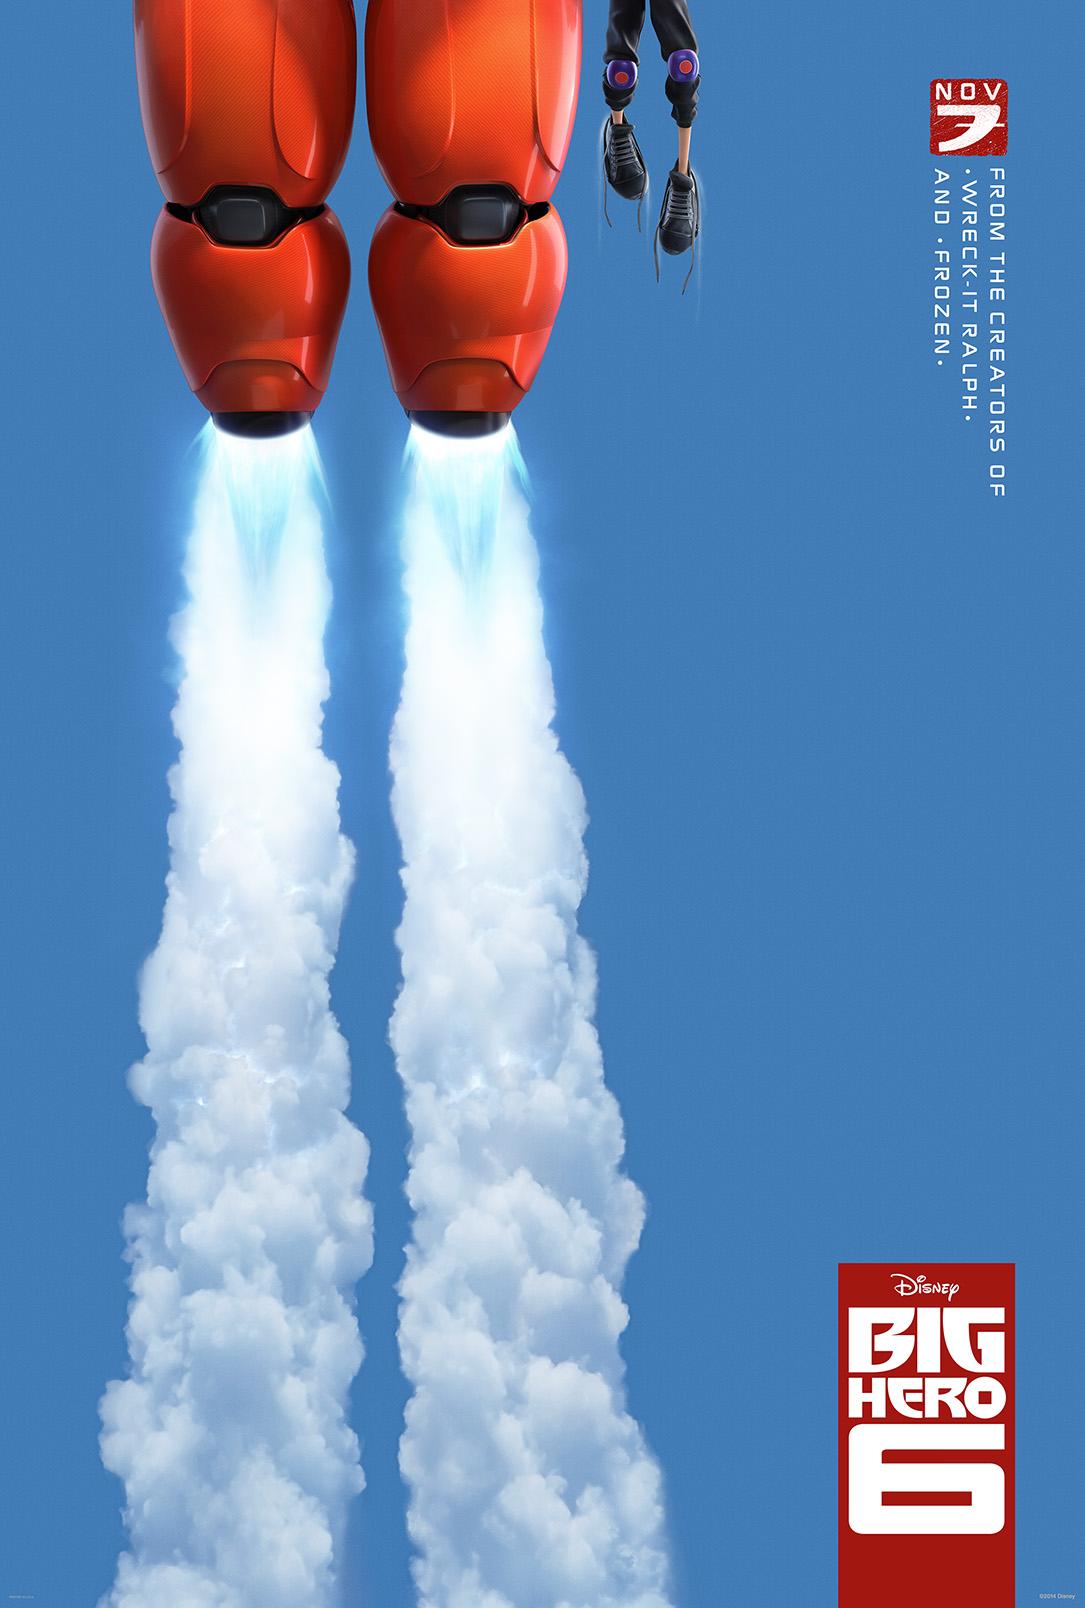 Disney BIG HERO 6 robot teaser poster mecha anime